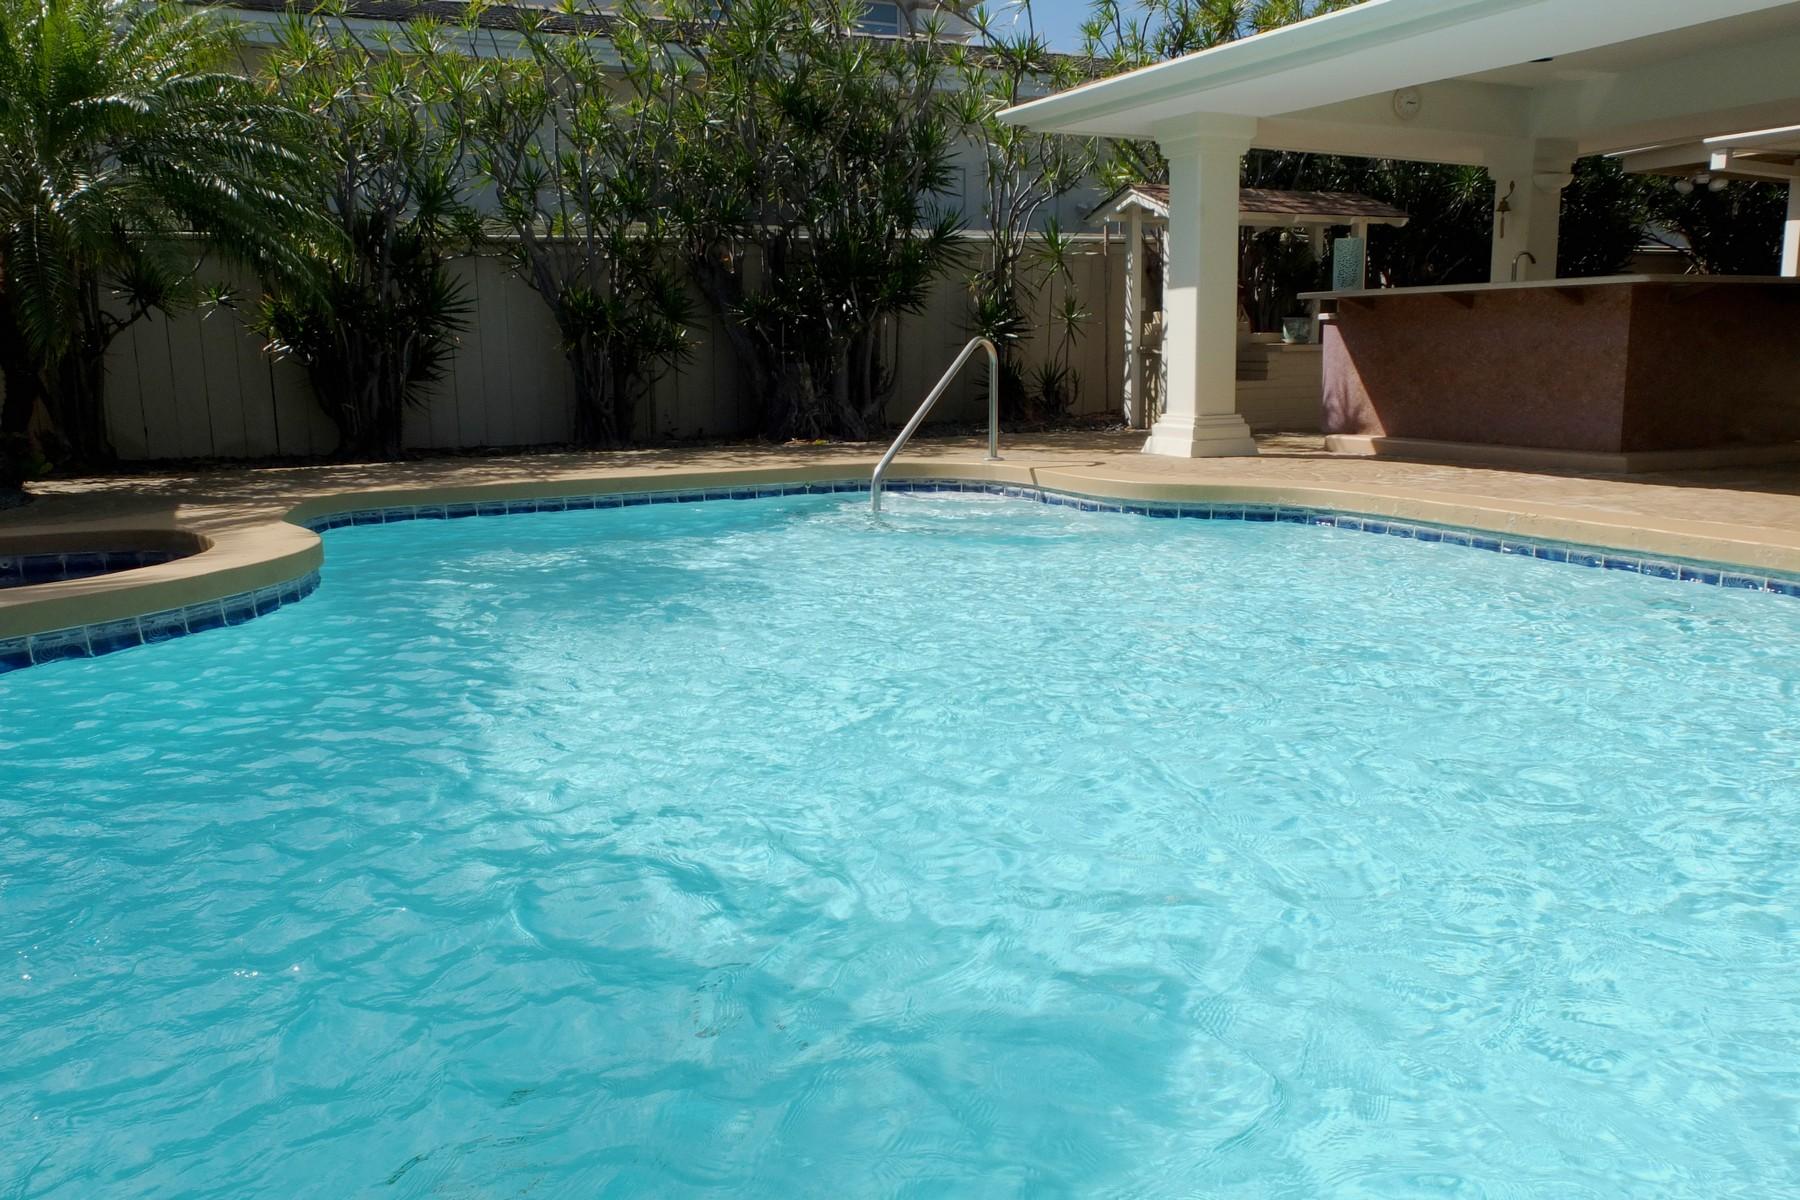 Additional photo for property listing at Desirable Kahala Home 4837 Kolohala Street Honolulu, Hawaii 96816 États-Unis